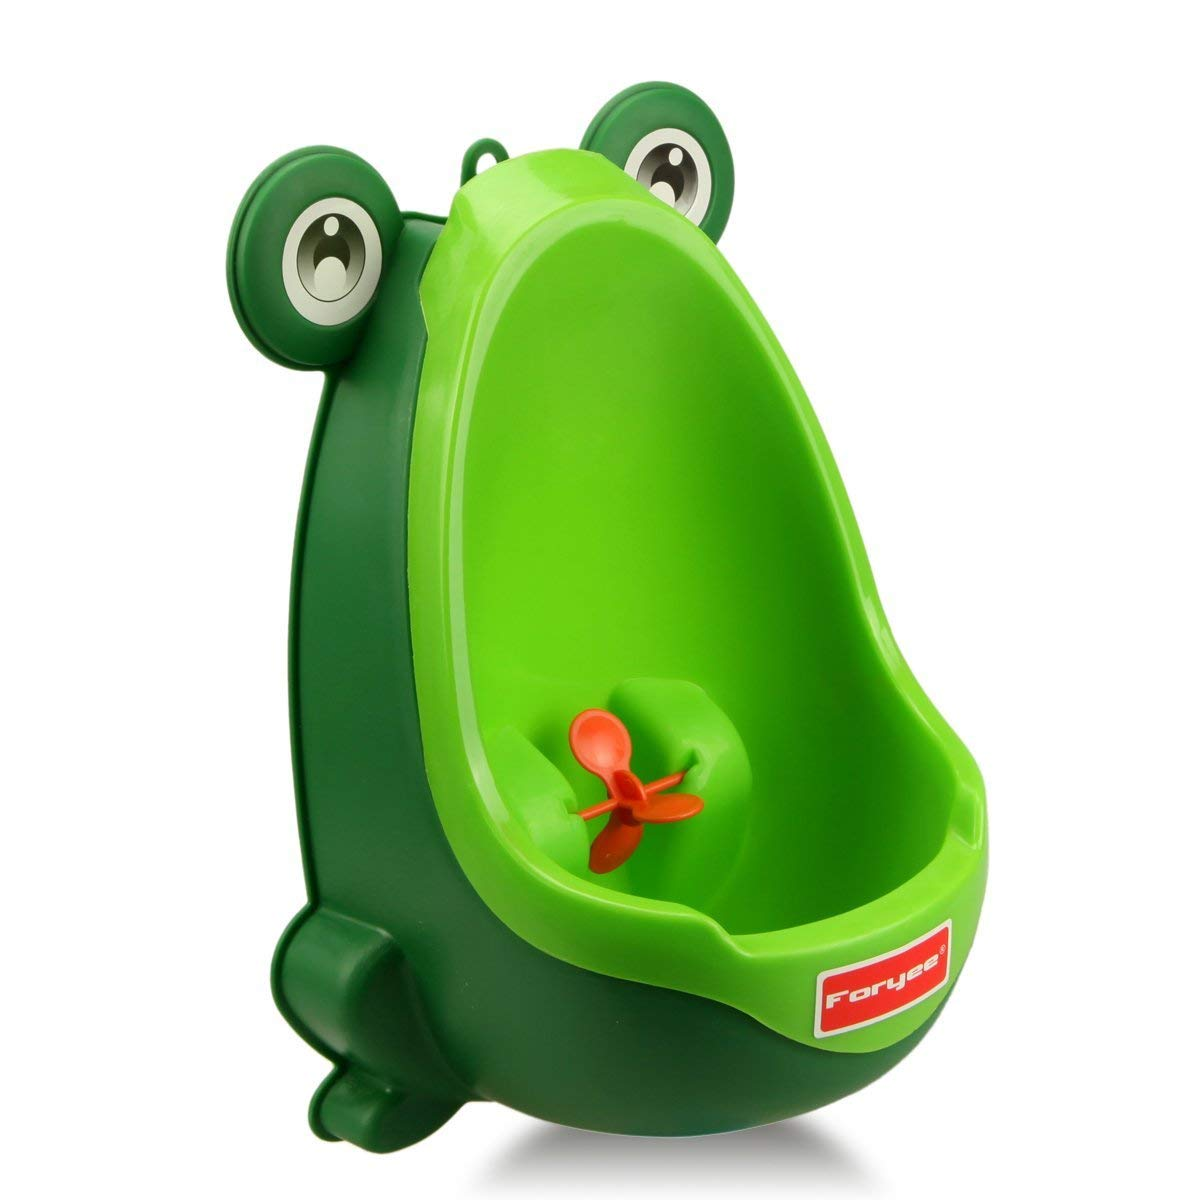 ICOCO Frog Boy Kids Baby Toilet